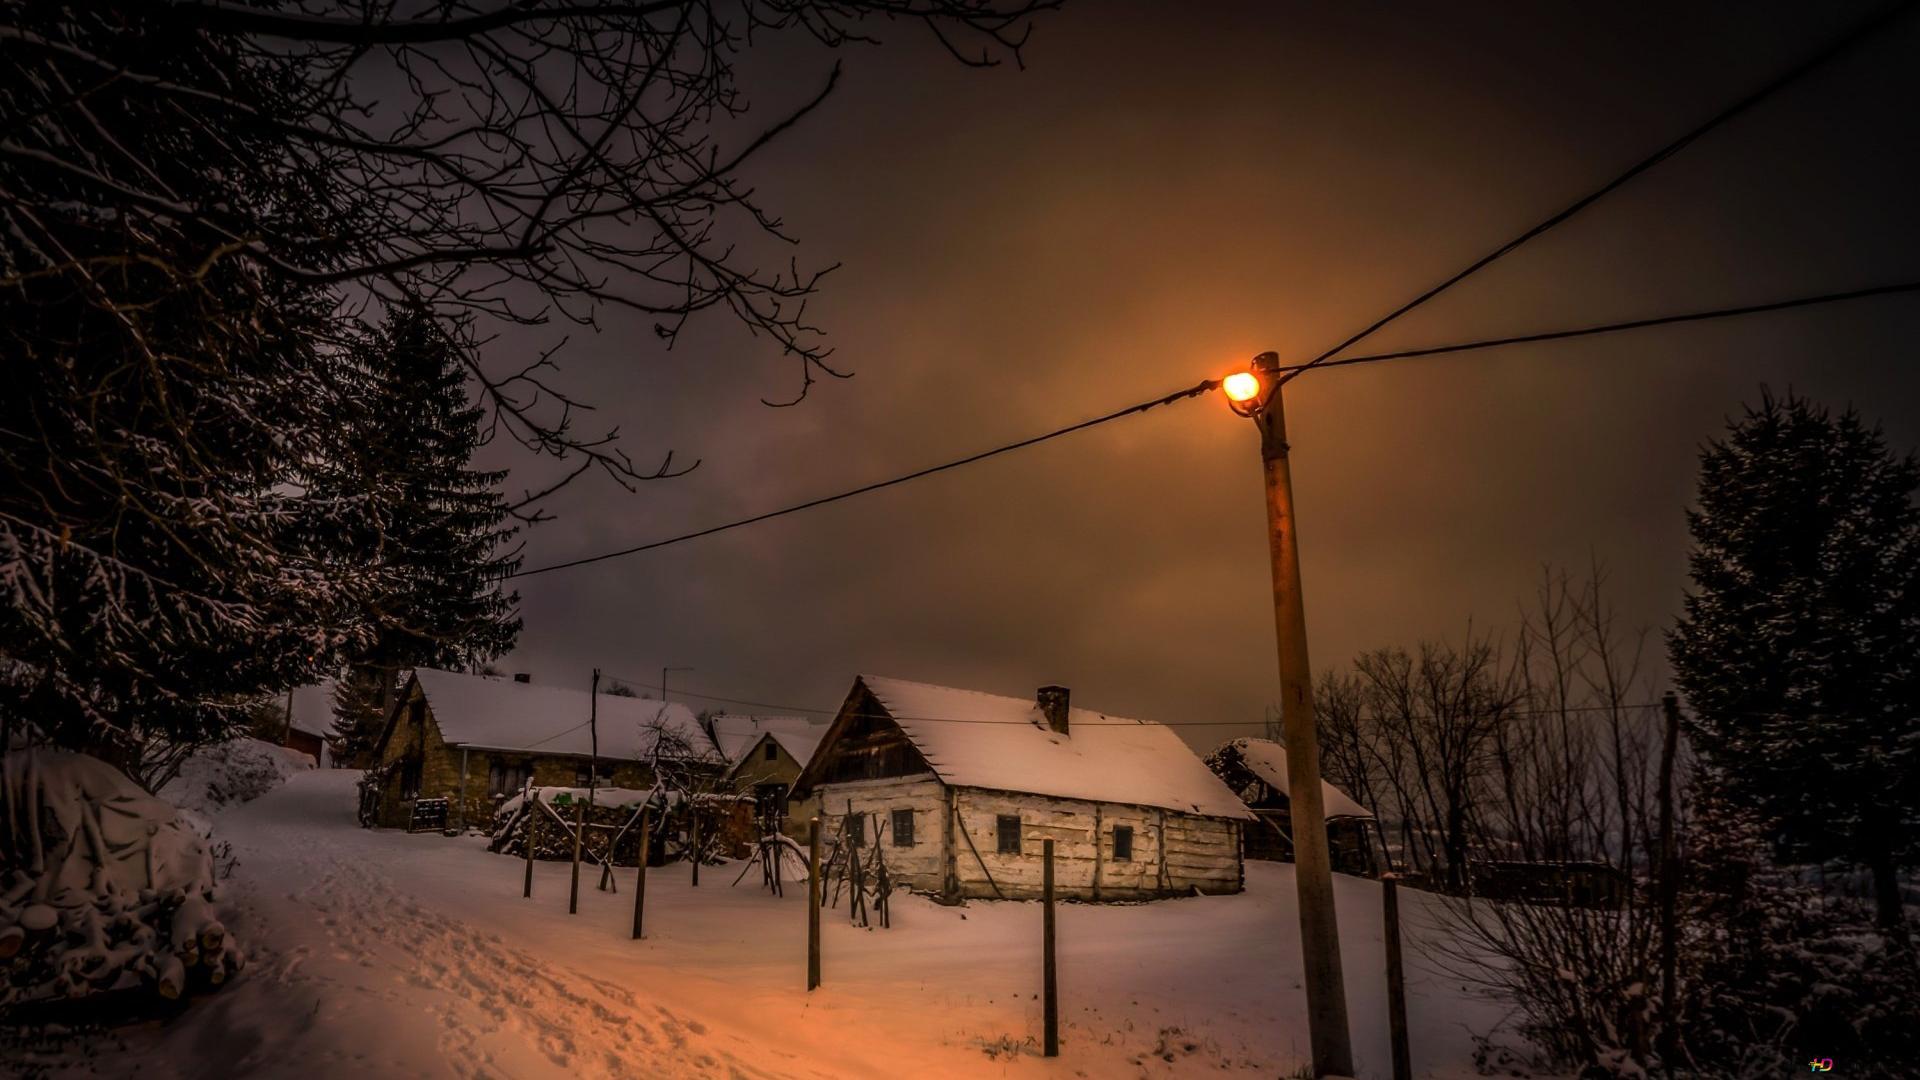 Winter Village At Night Hd Wallpaper Download